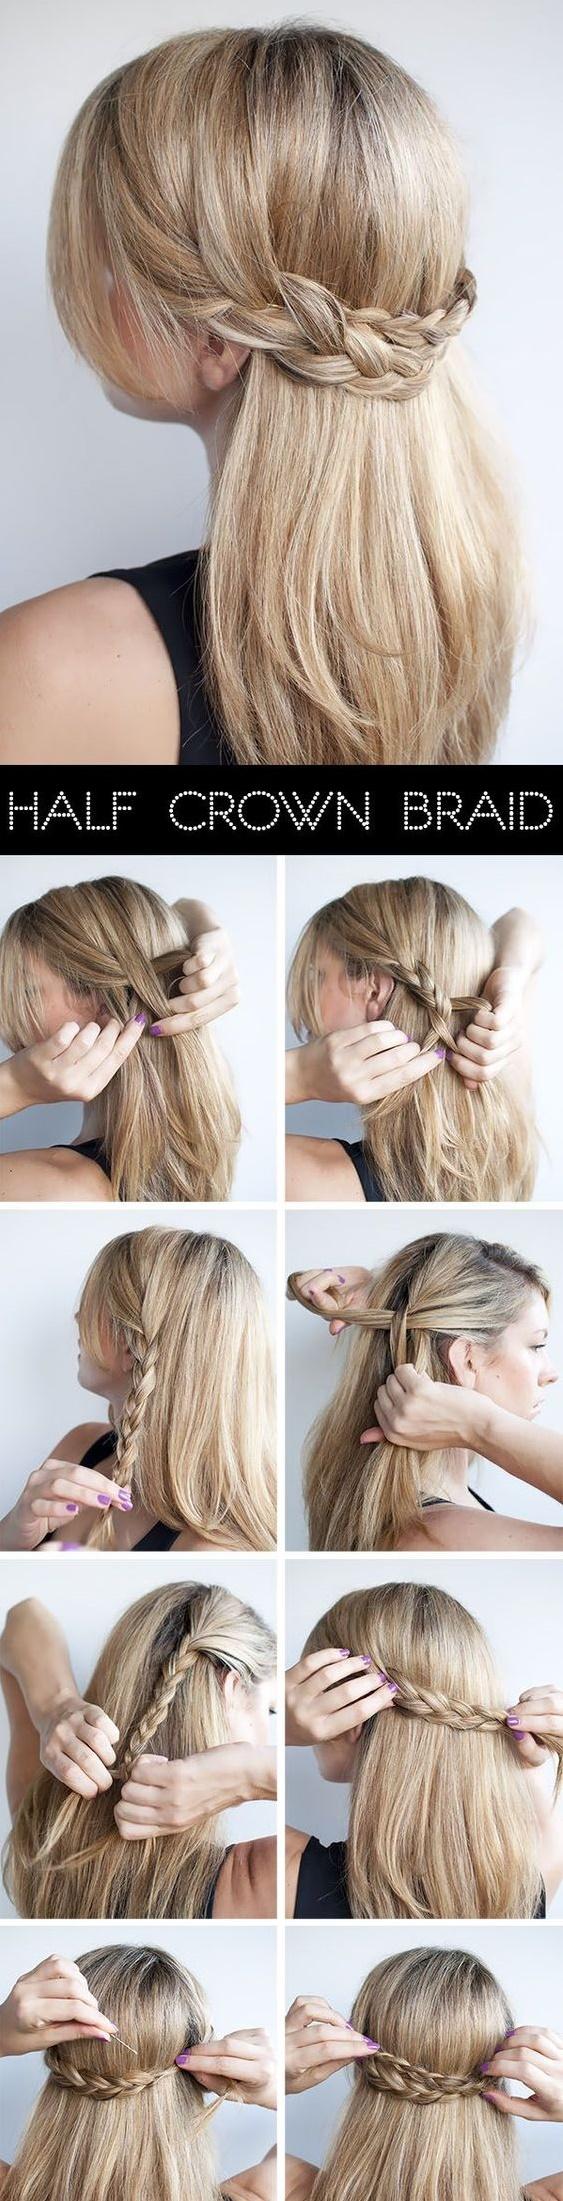 braid-crown